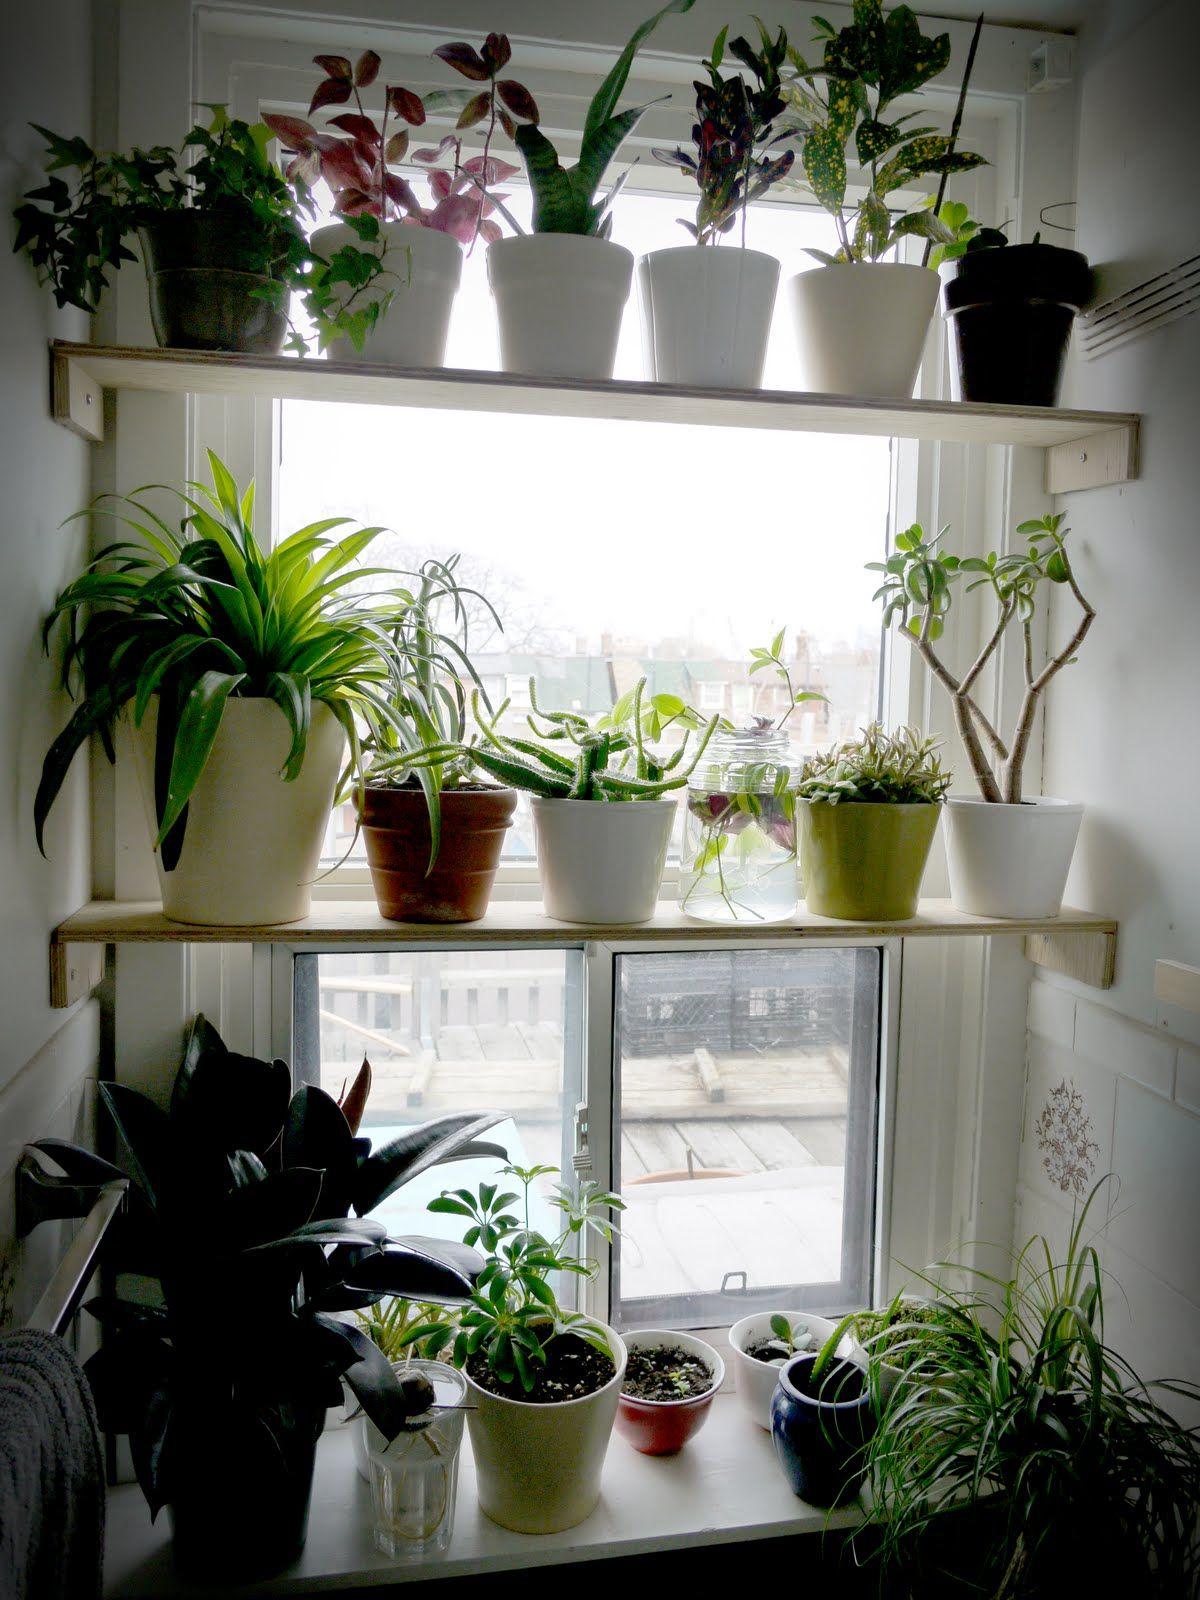 Pin By Theresa Marion On Urban Gardening Window Shelf